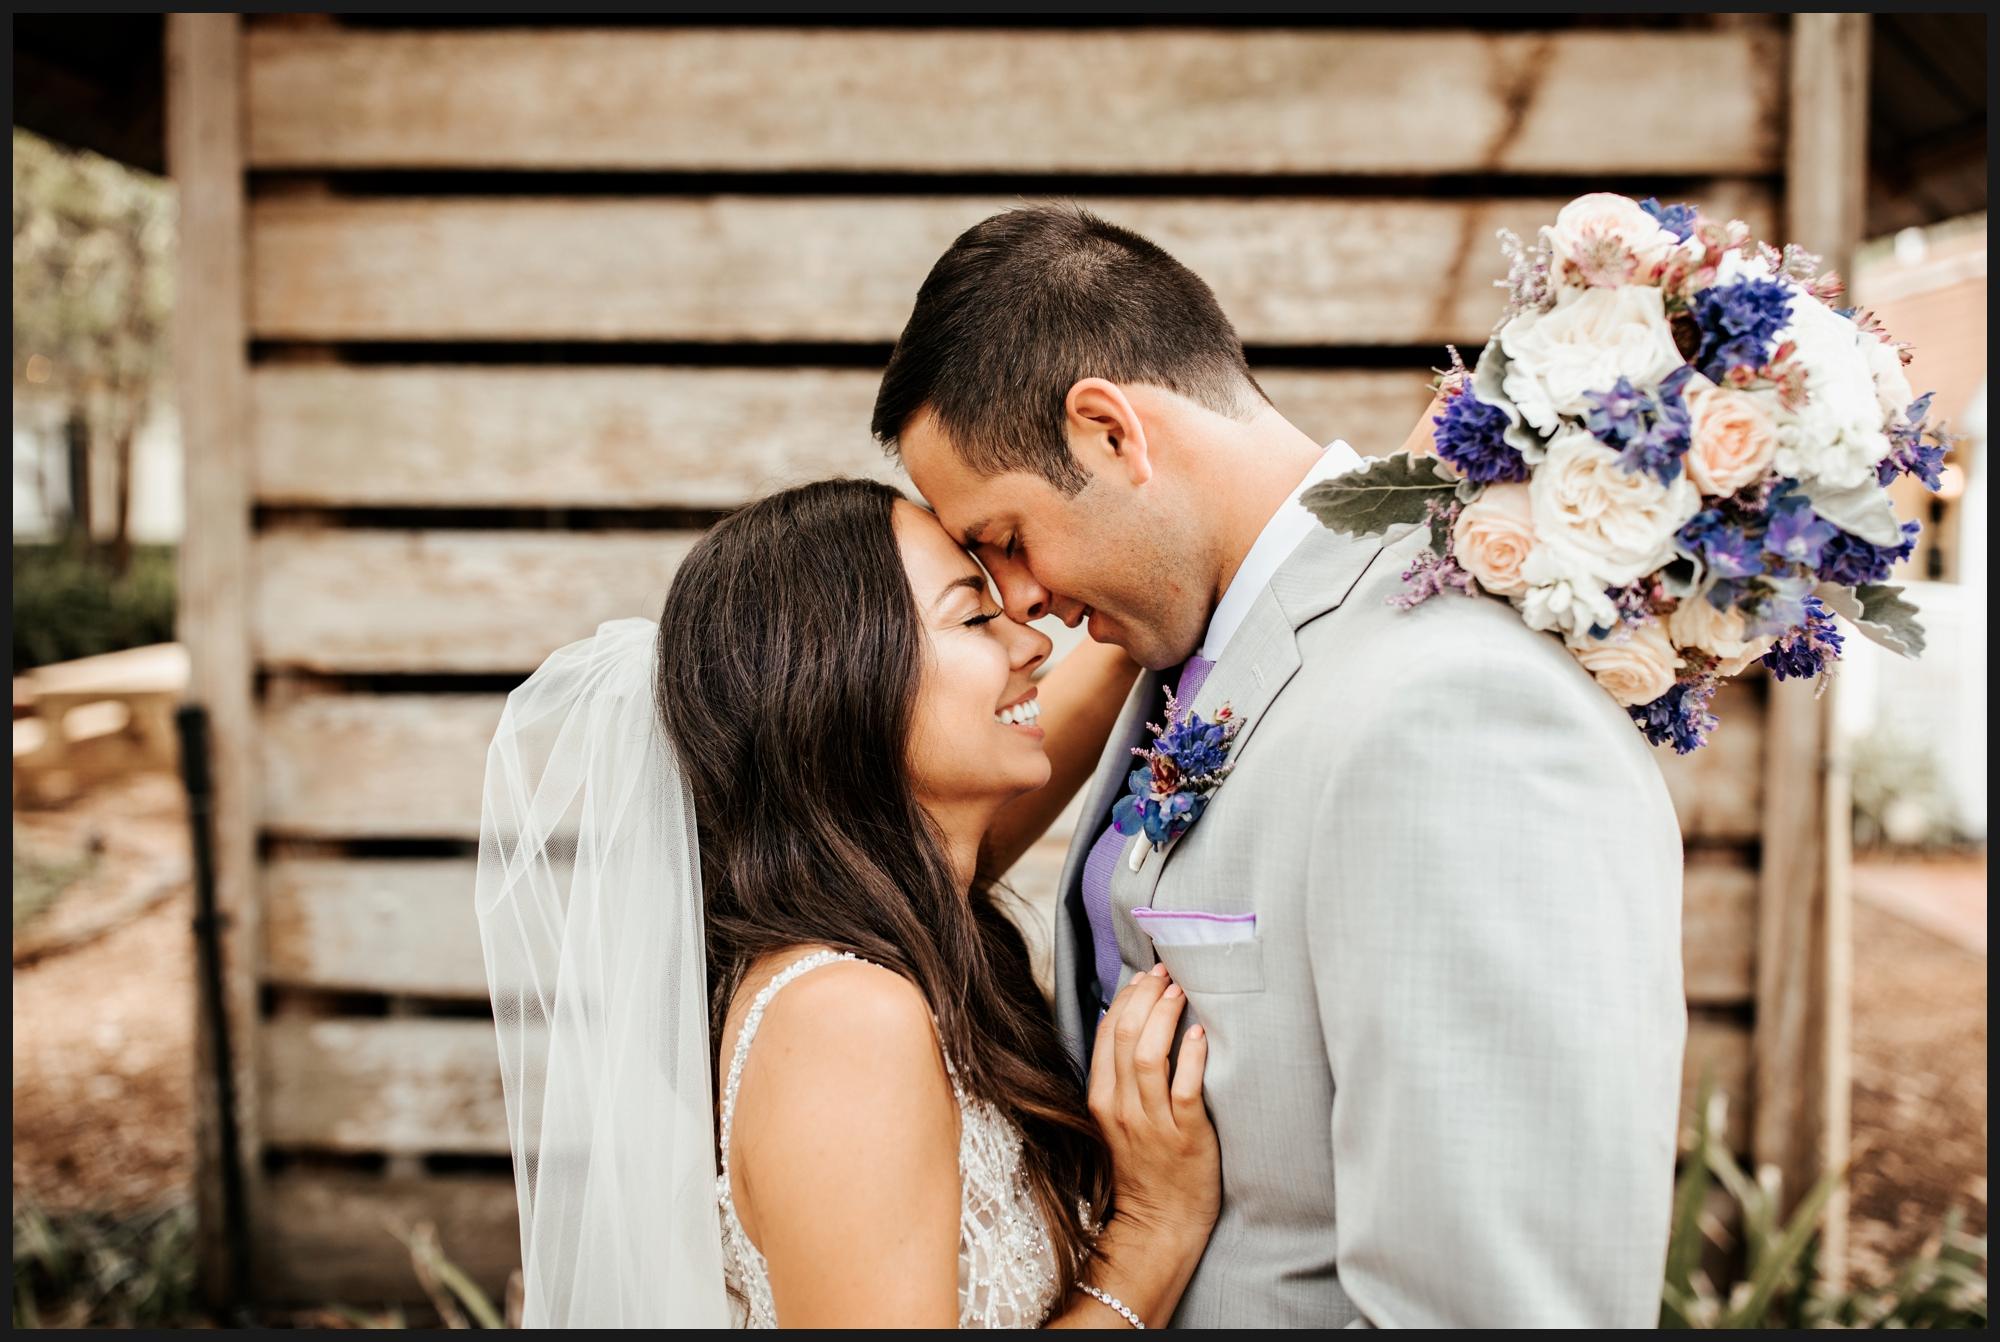 Orlando-Wedding-Photographer-destination-wedding-photographer-florida-wedding-photographer-bohemian-wedding-photographer_1599.jpg